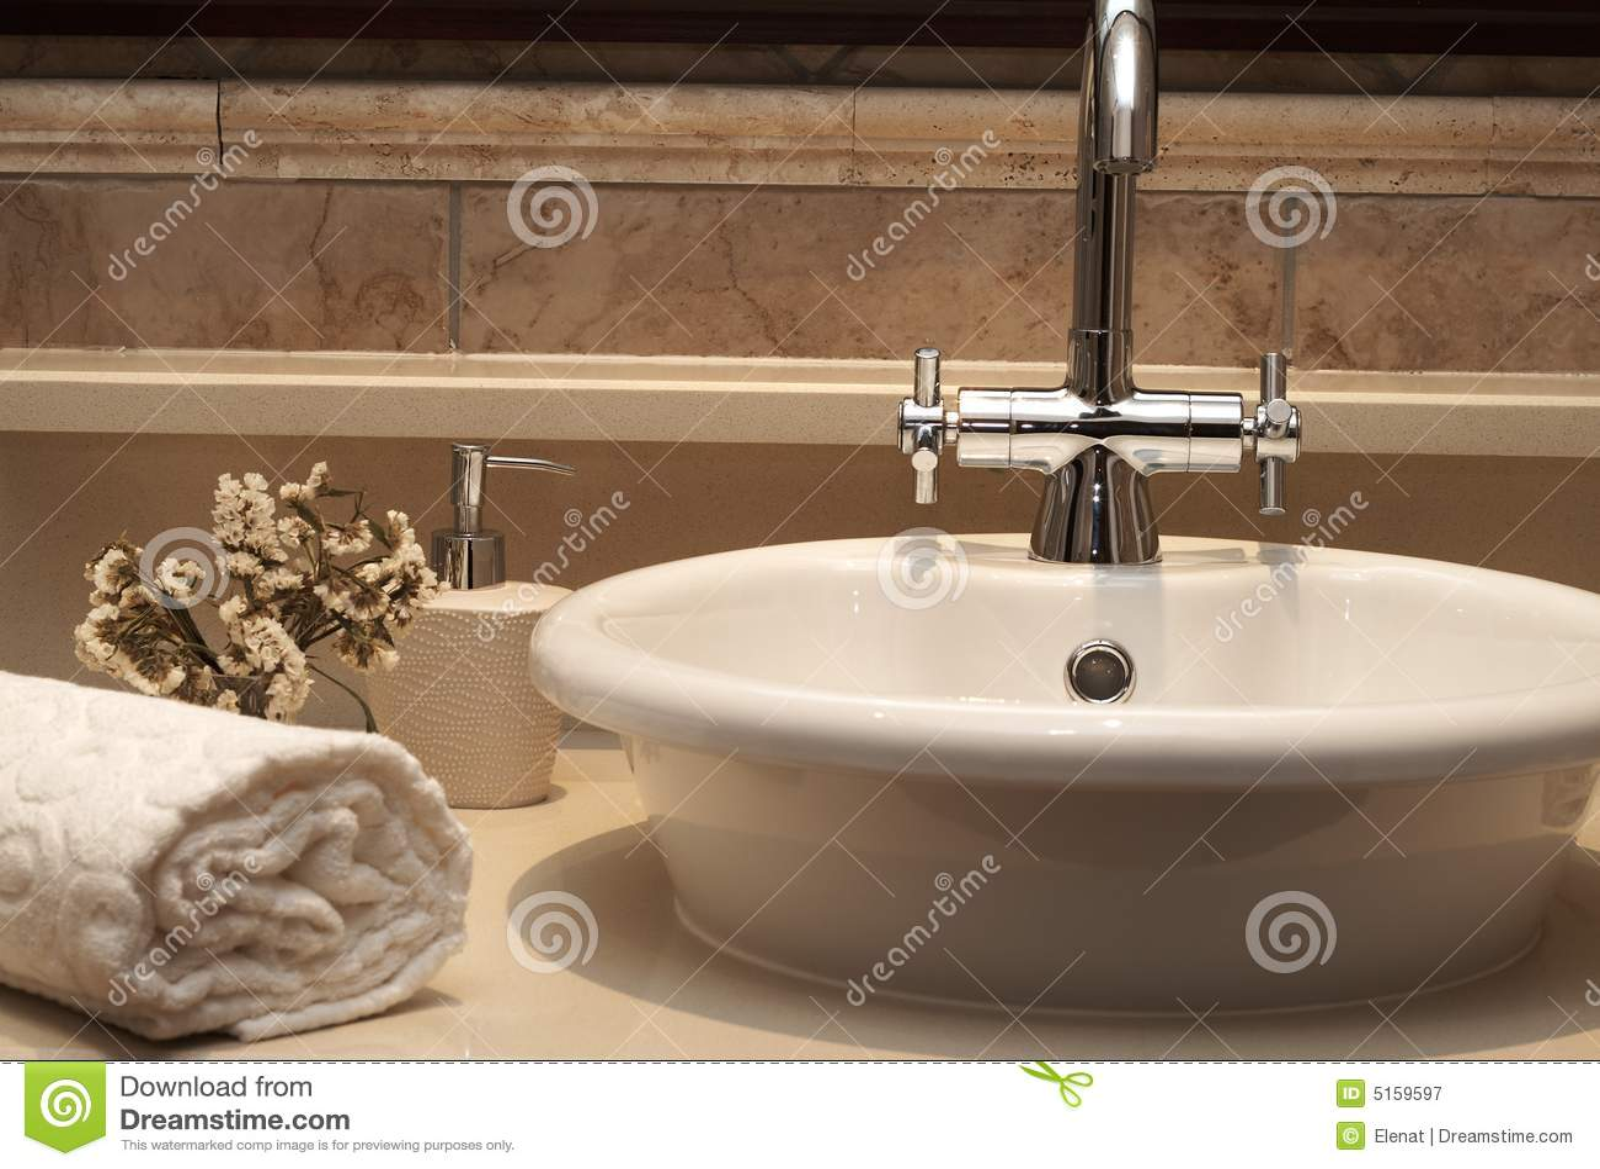 Beautiful Sink In A Bathroom Royalty Free Stock